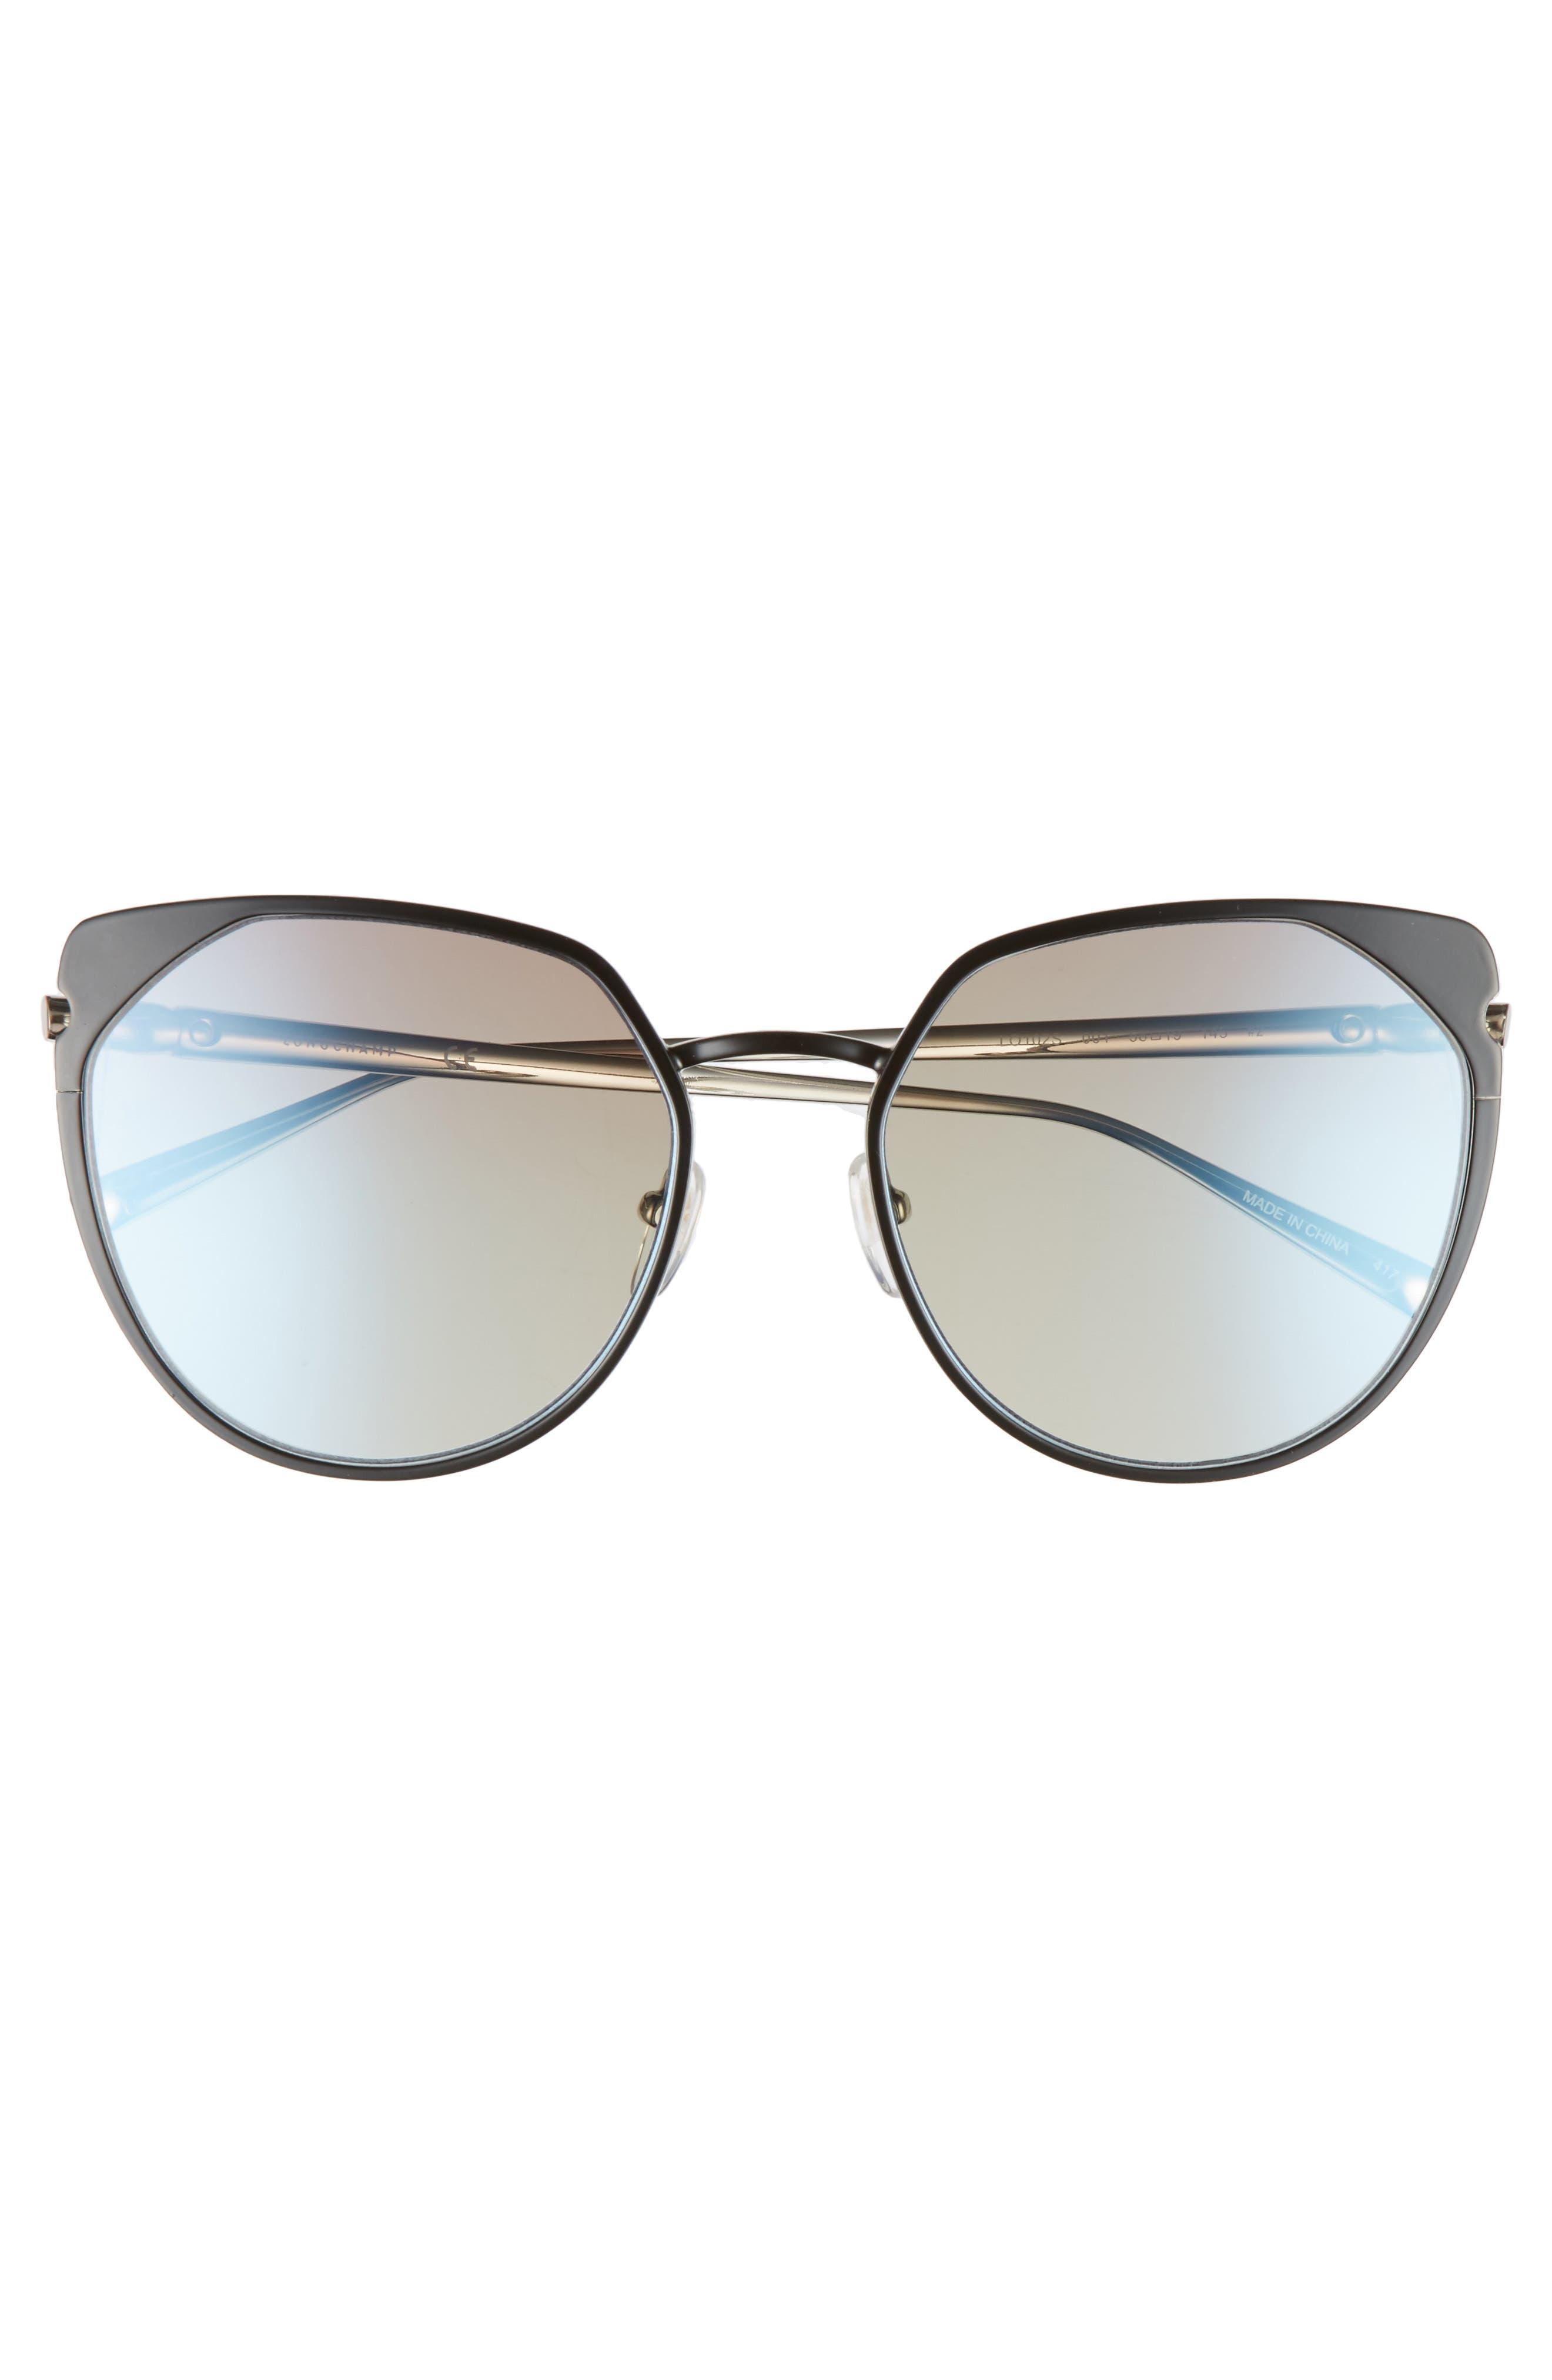 58mm Rounded Cat Eye Sunglasses,                             Alternate thumbnail 3, color,                             001